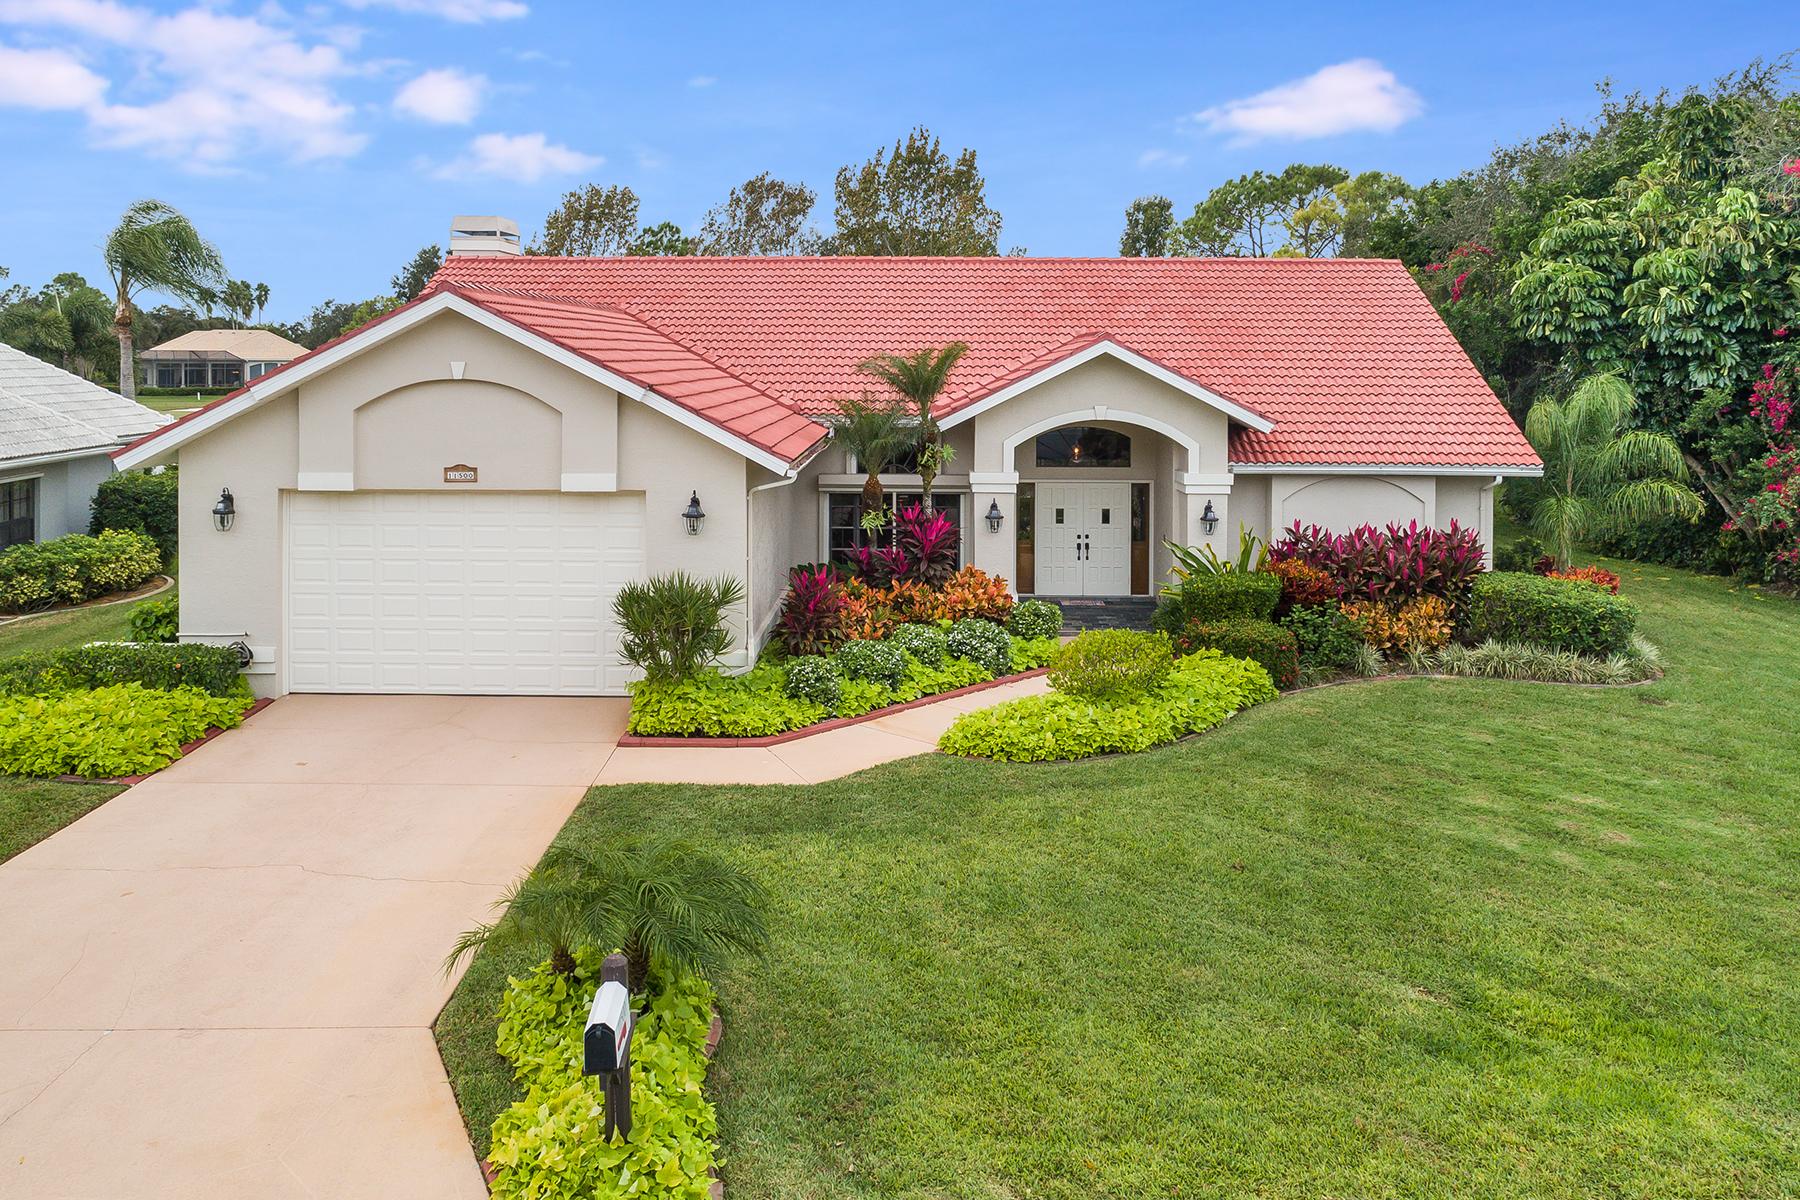 Single Family Homes のために 売買 アット FORT MYERS 11500 Mahogany Run, Fort Myers, フロリダ 33913 アメリカ